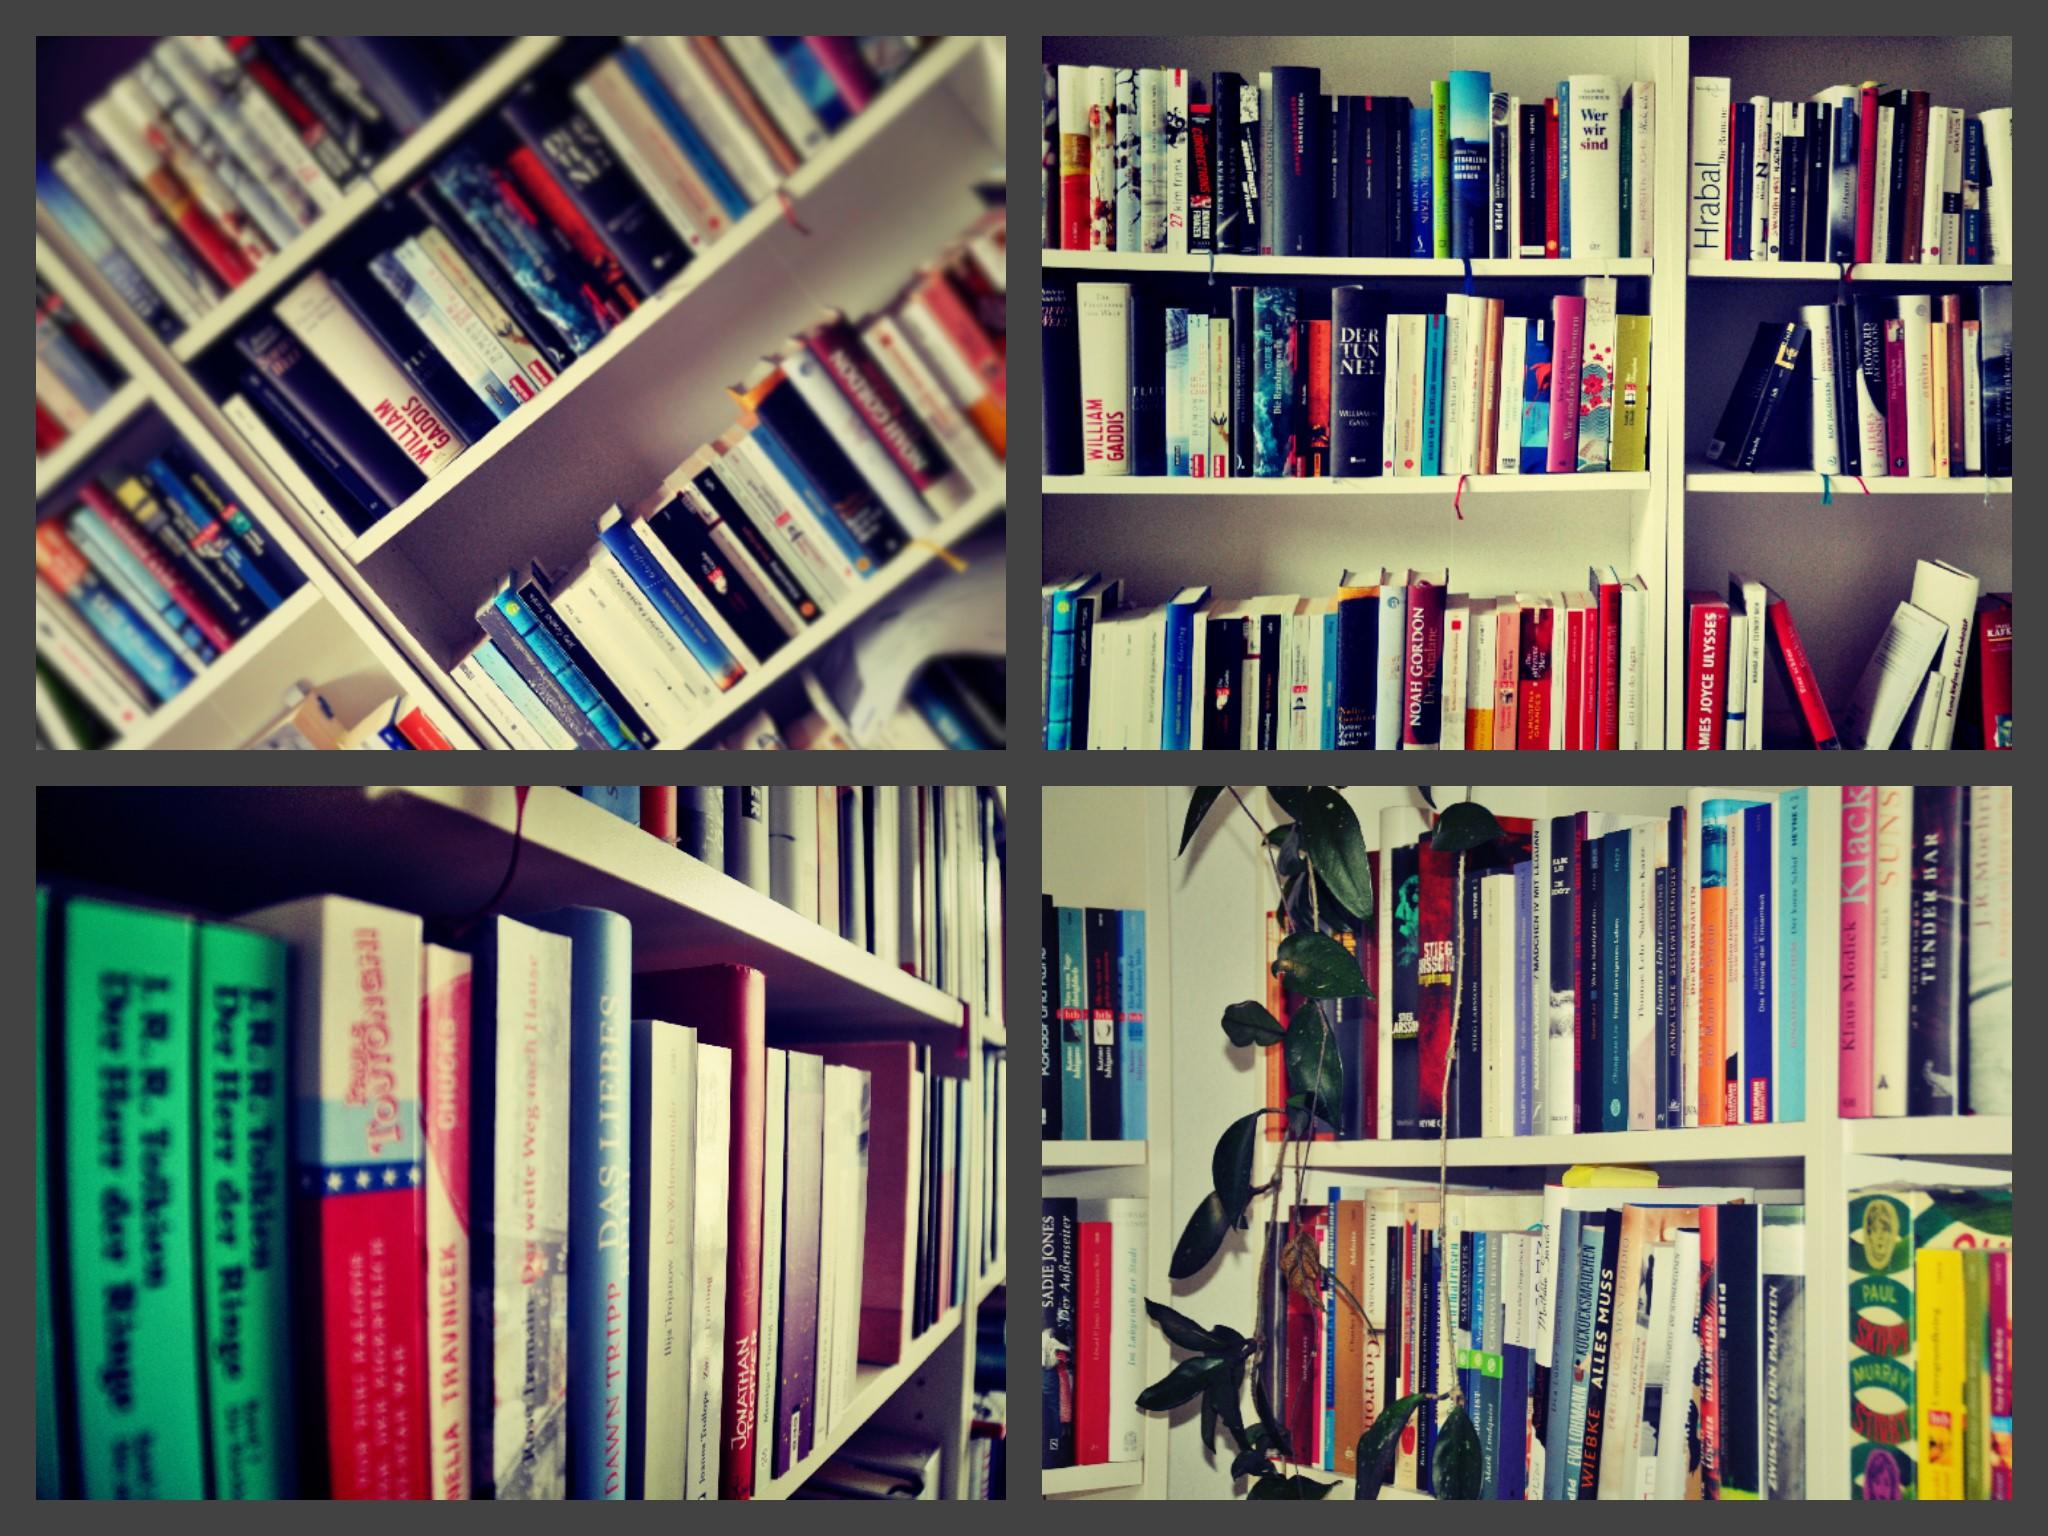 Bibliothek Collage